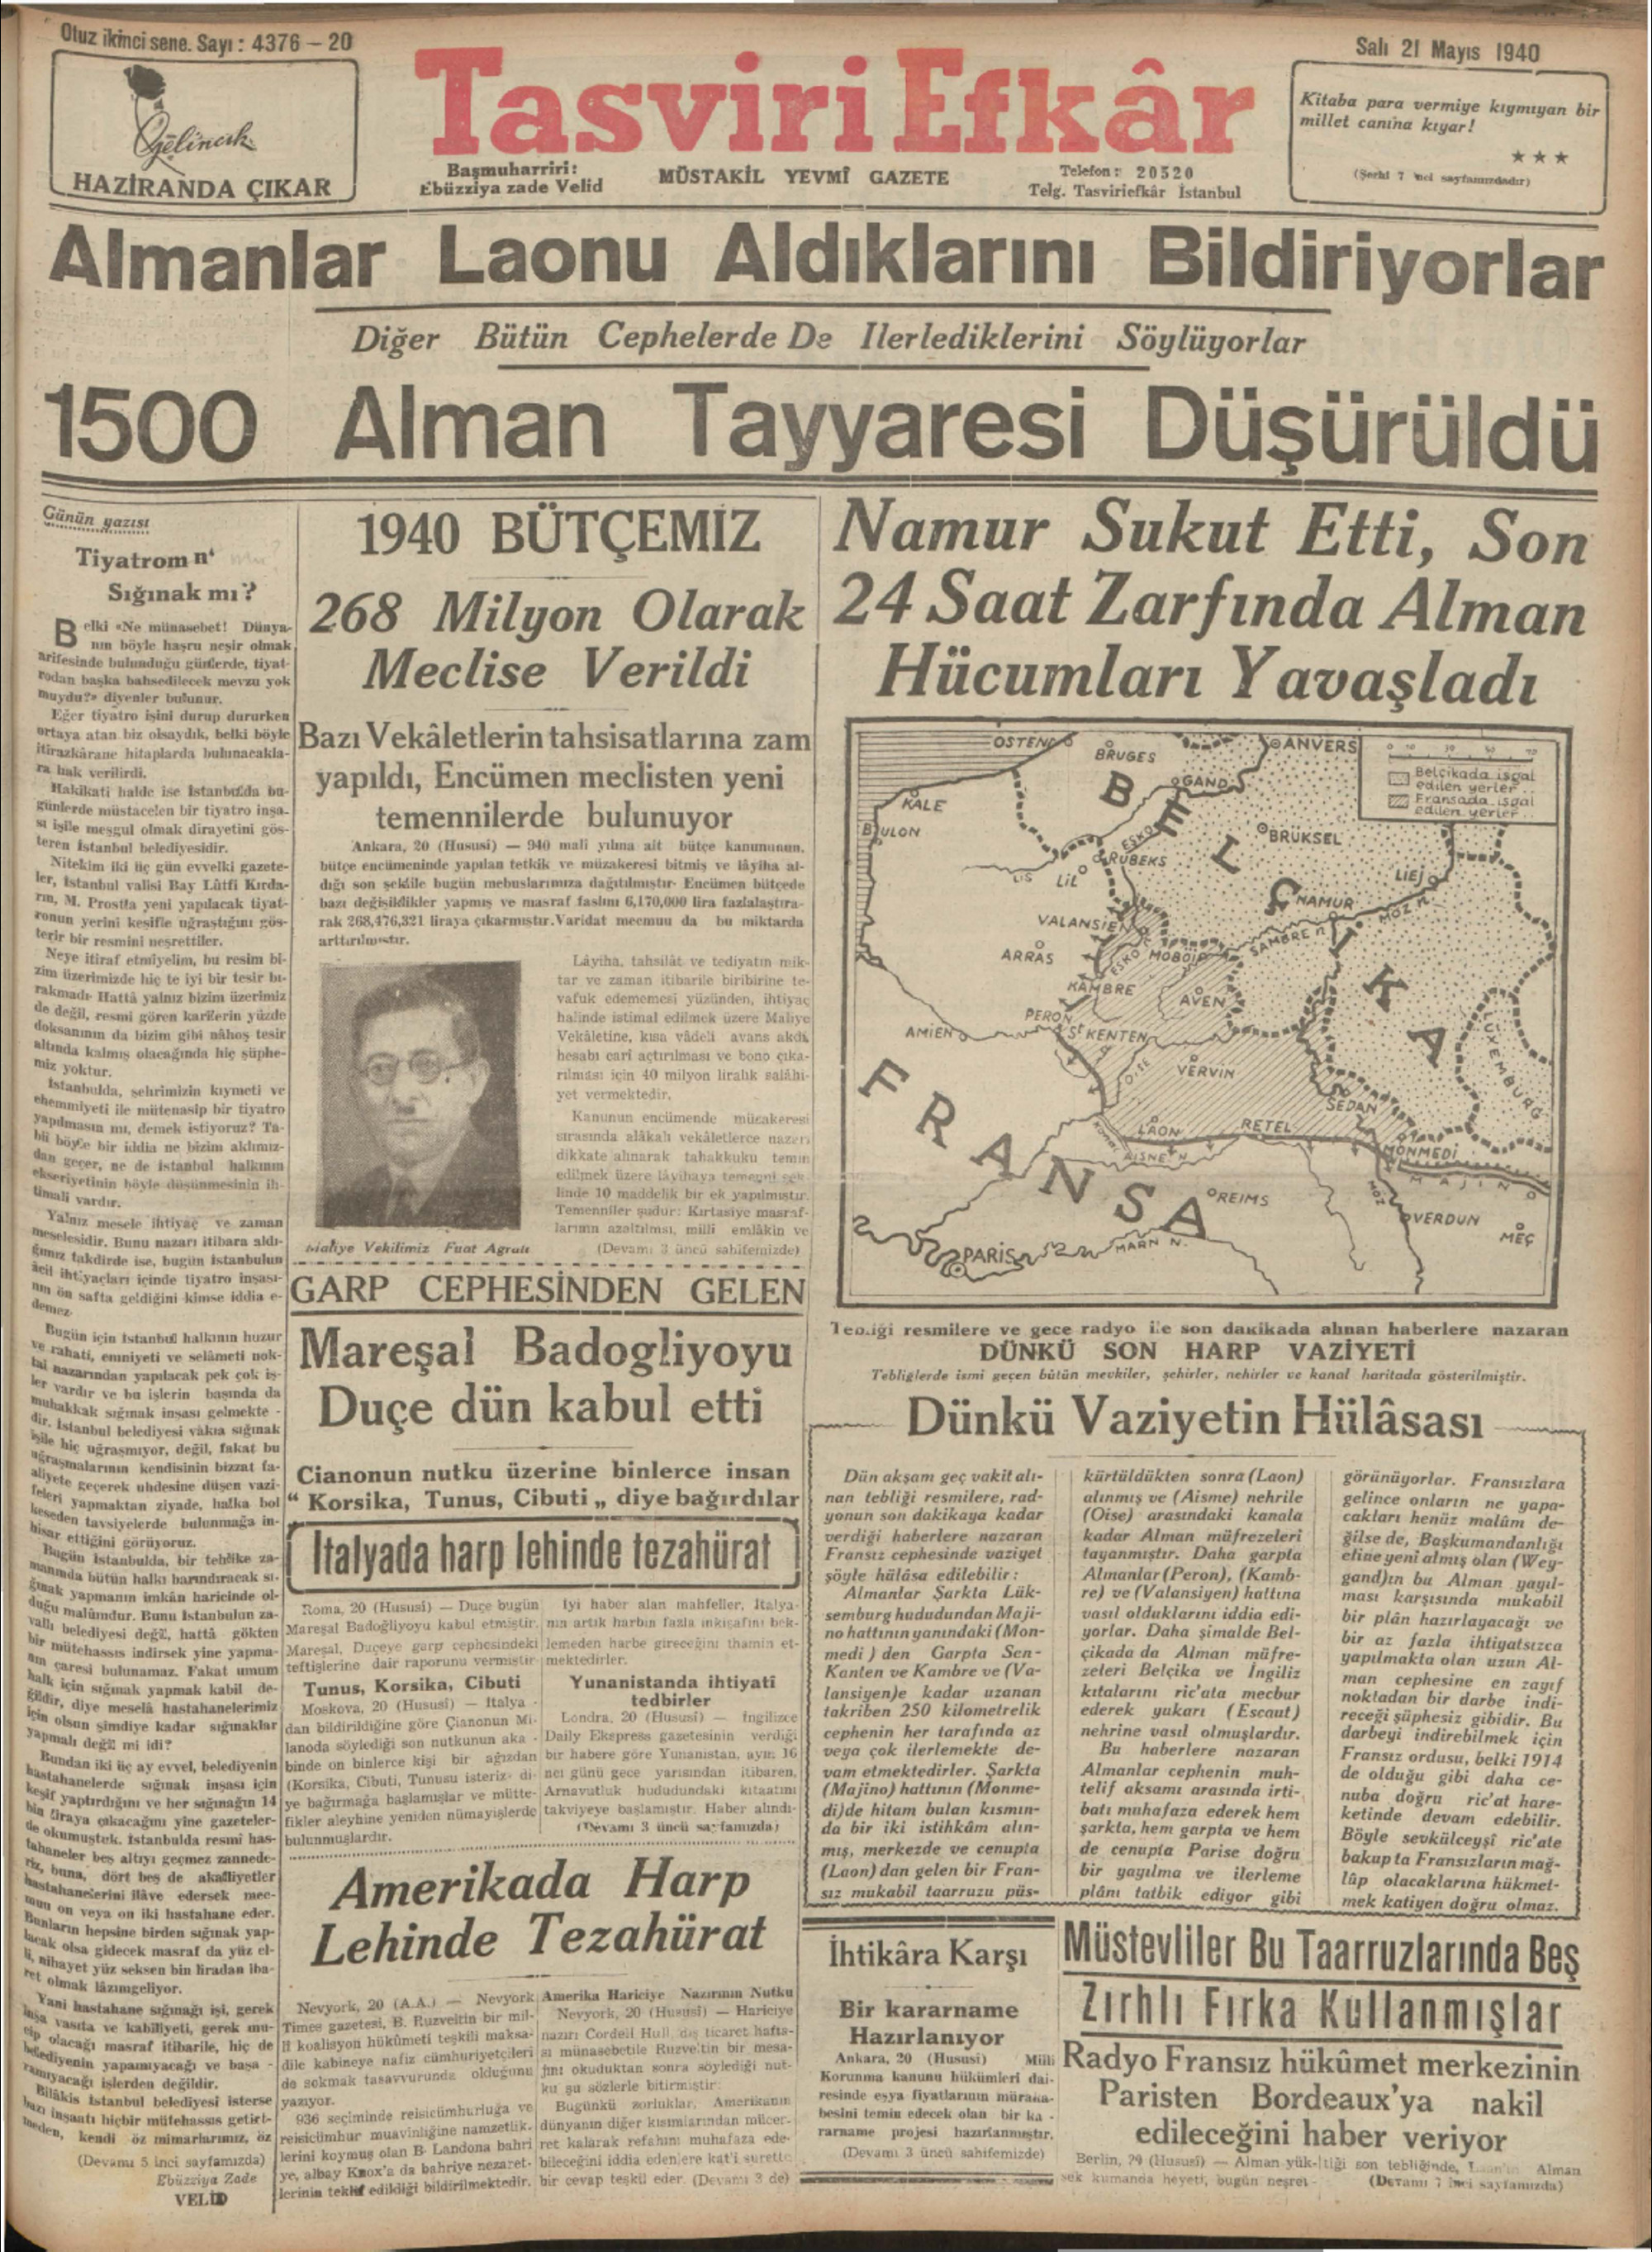 21 Mayıs 1940 Tarihli Tasviri Efkar Gazetesi Sayfa 1